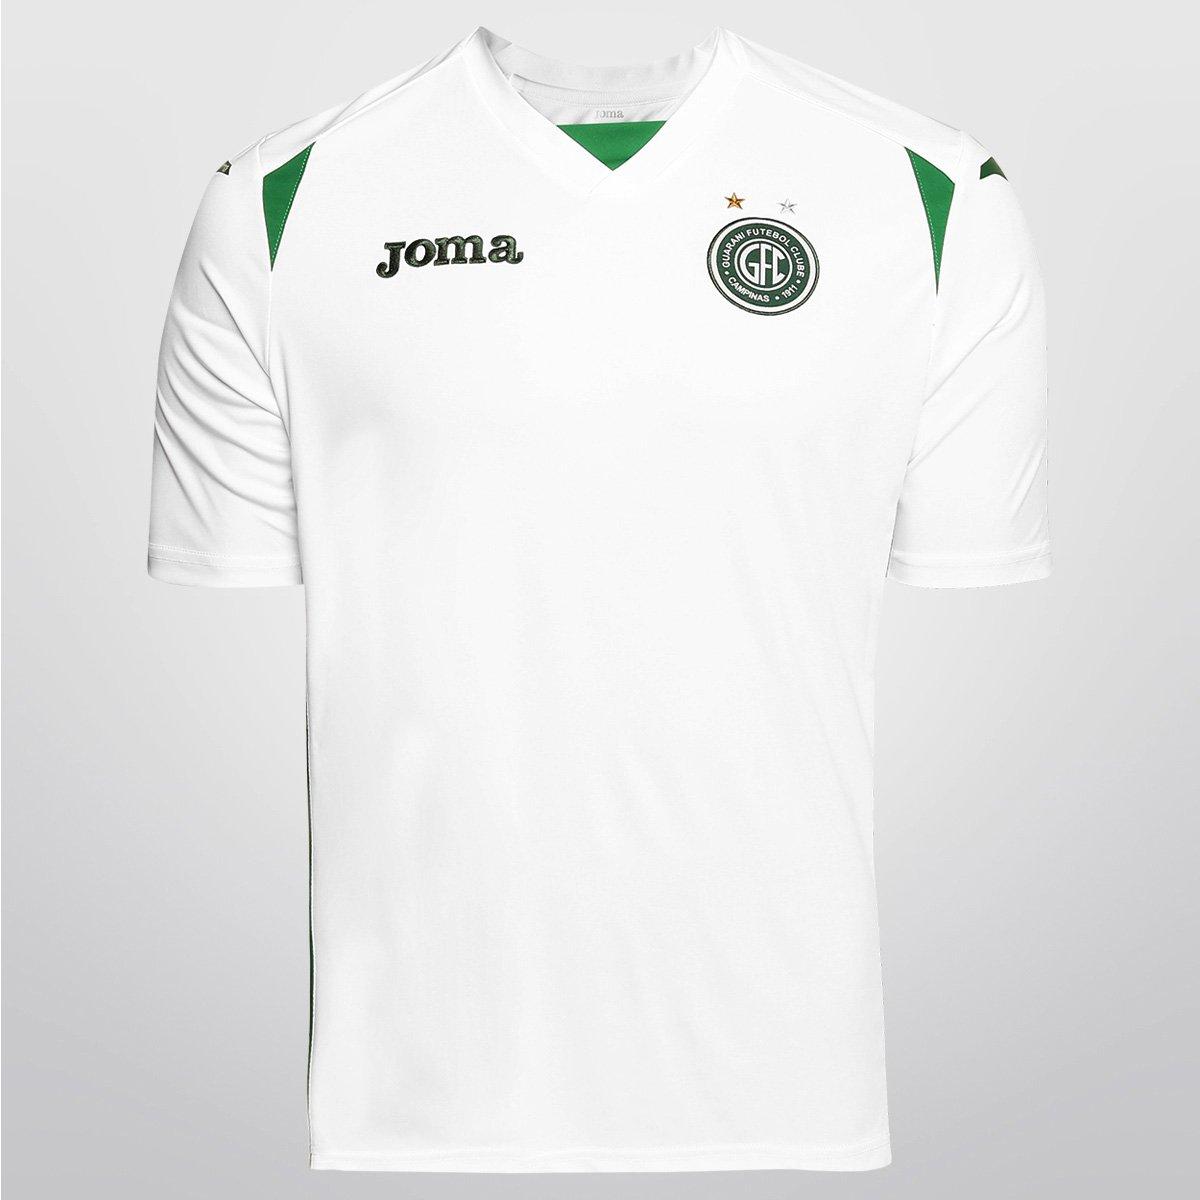 98d16d9b8b Camisa Joma Guarani II 2015 s nº - Compre Agora